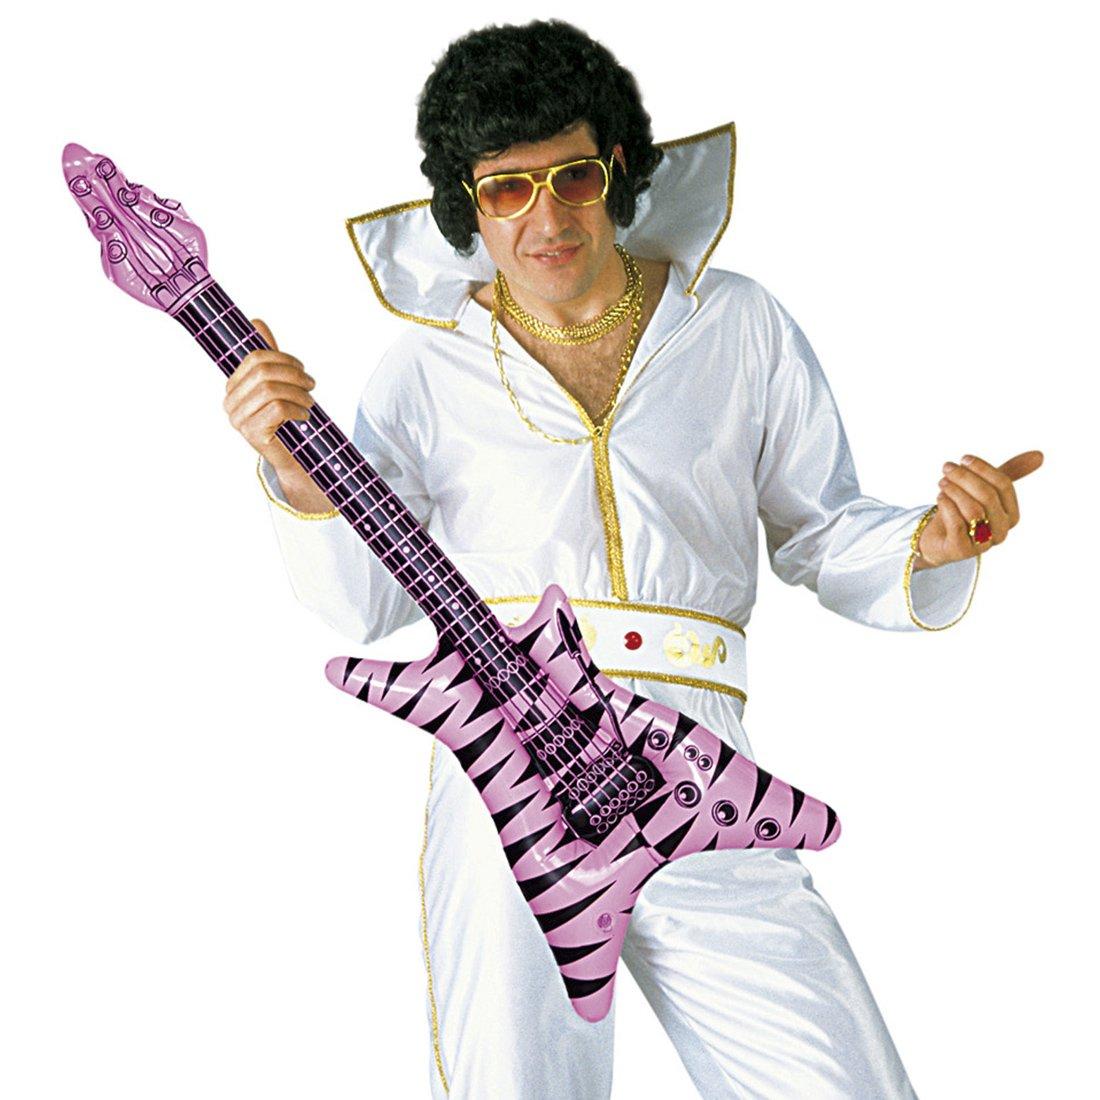 Amakando Deko Luftgitarre Rockstar Gummigitarre Funky Rocker Inflatable Guitar Aufblasbare Gitarre Partydeko aufblasbar Mottoparty Musikinstrument Accessoire Party Gitarren Instrument